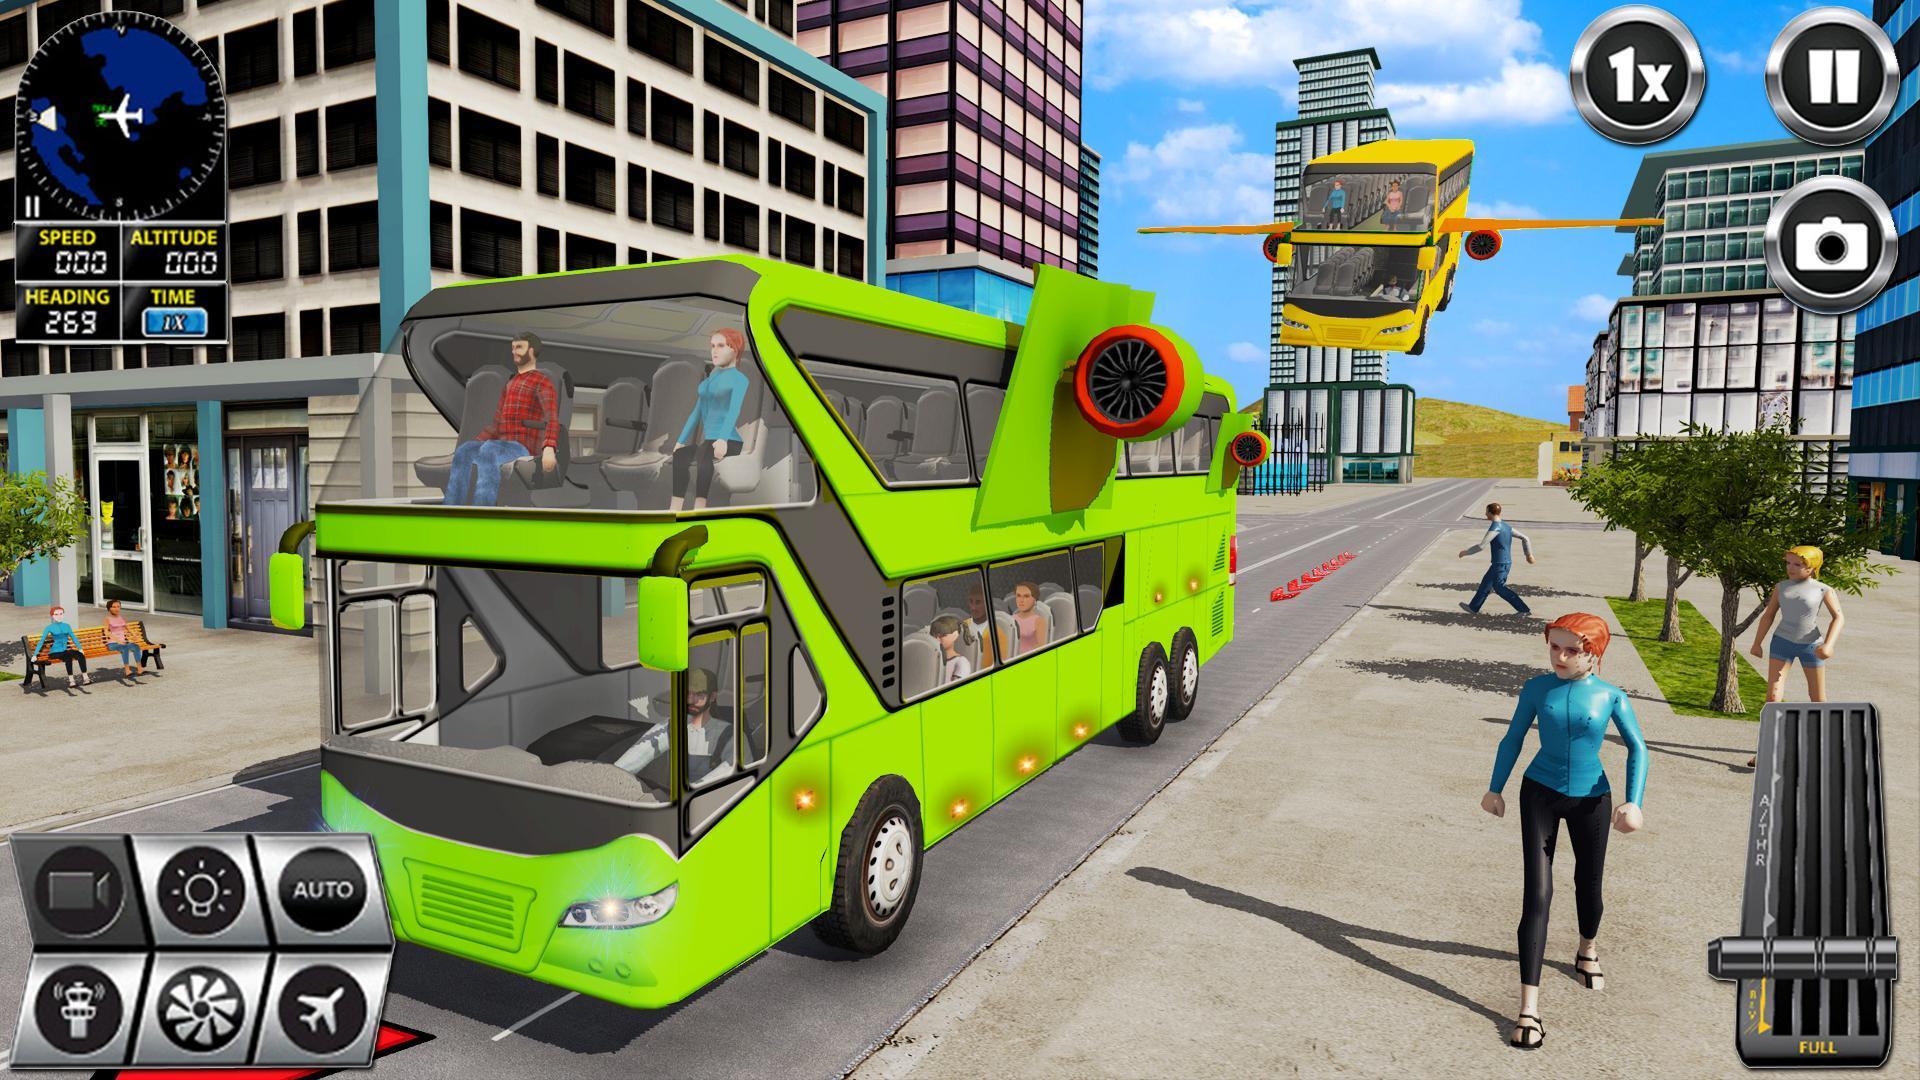 Flying Bus Driving simulator 2019: Free Bus Games 2.8 Screenshot 4